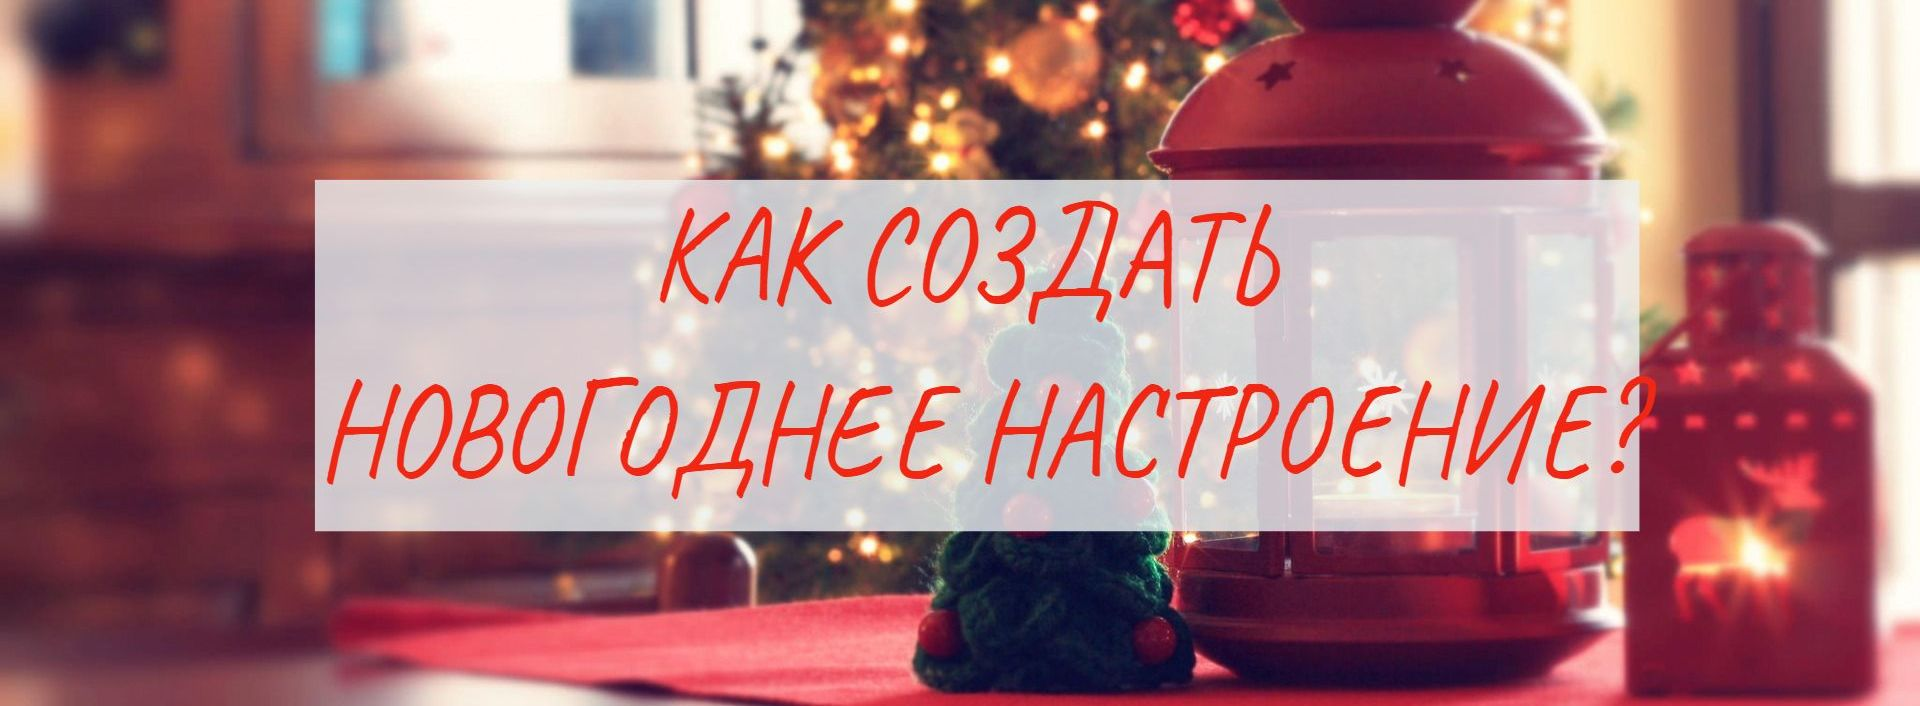 image (1)1.jpeg